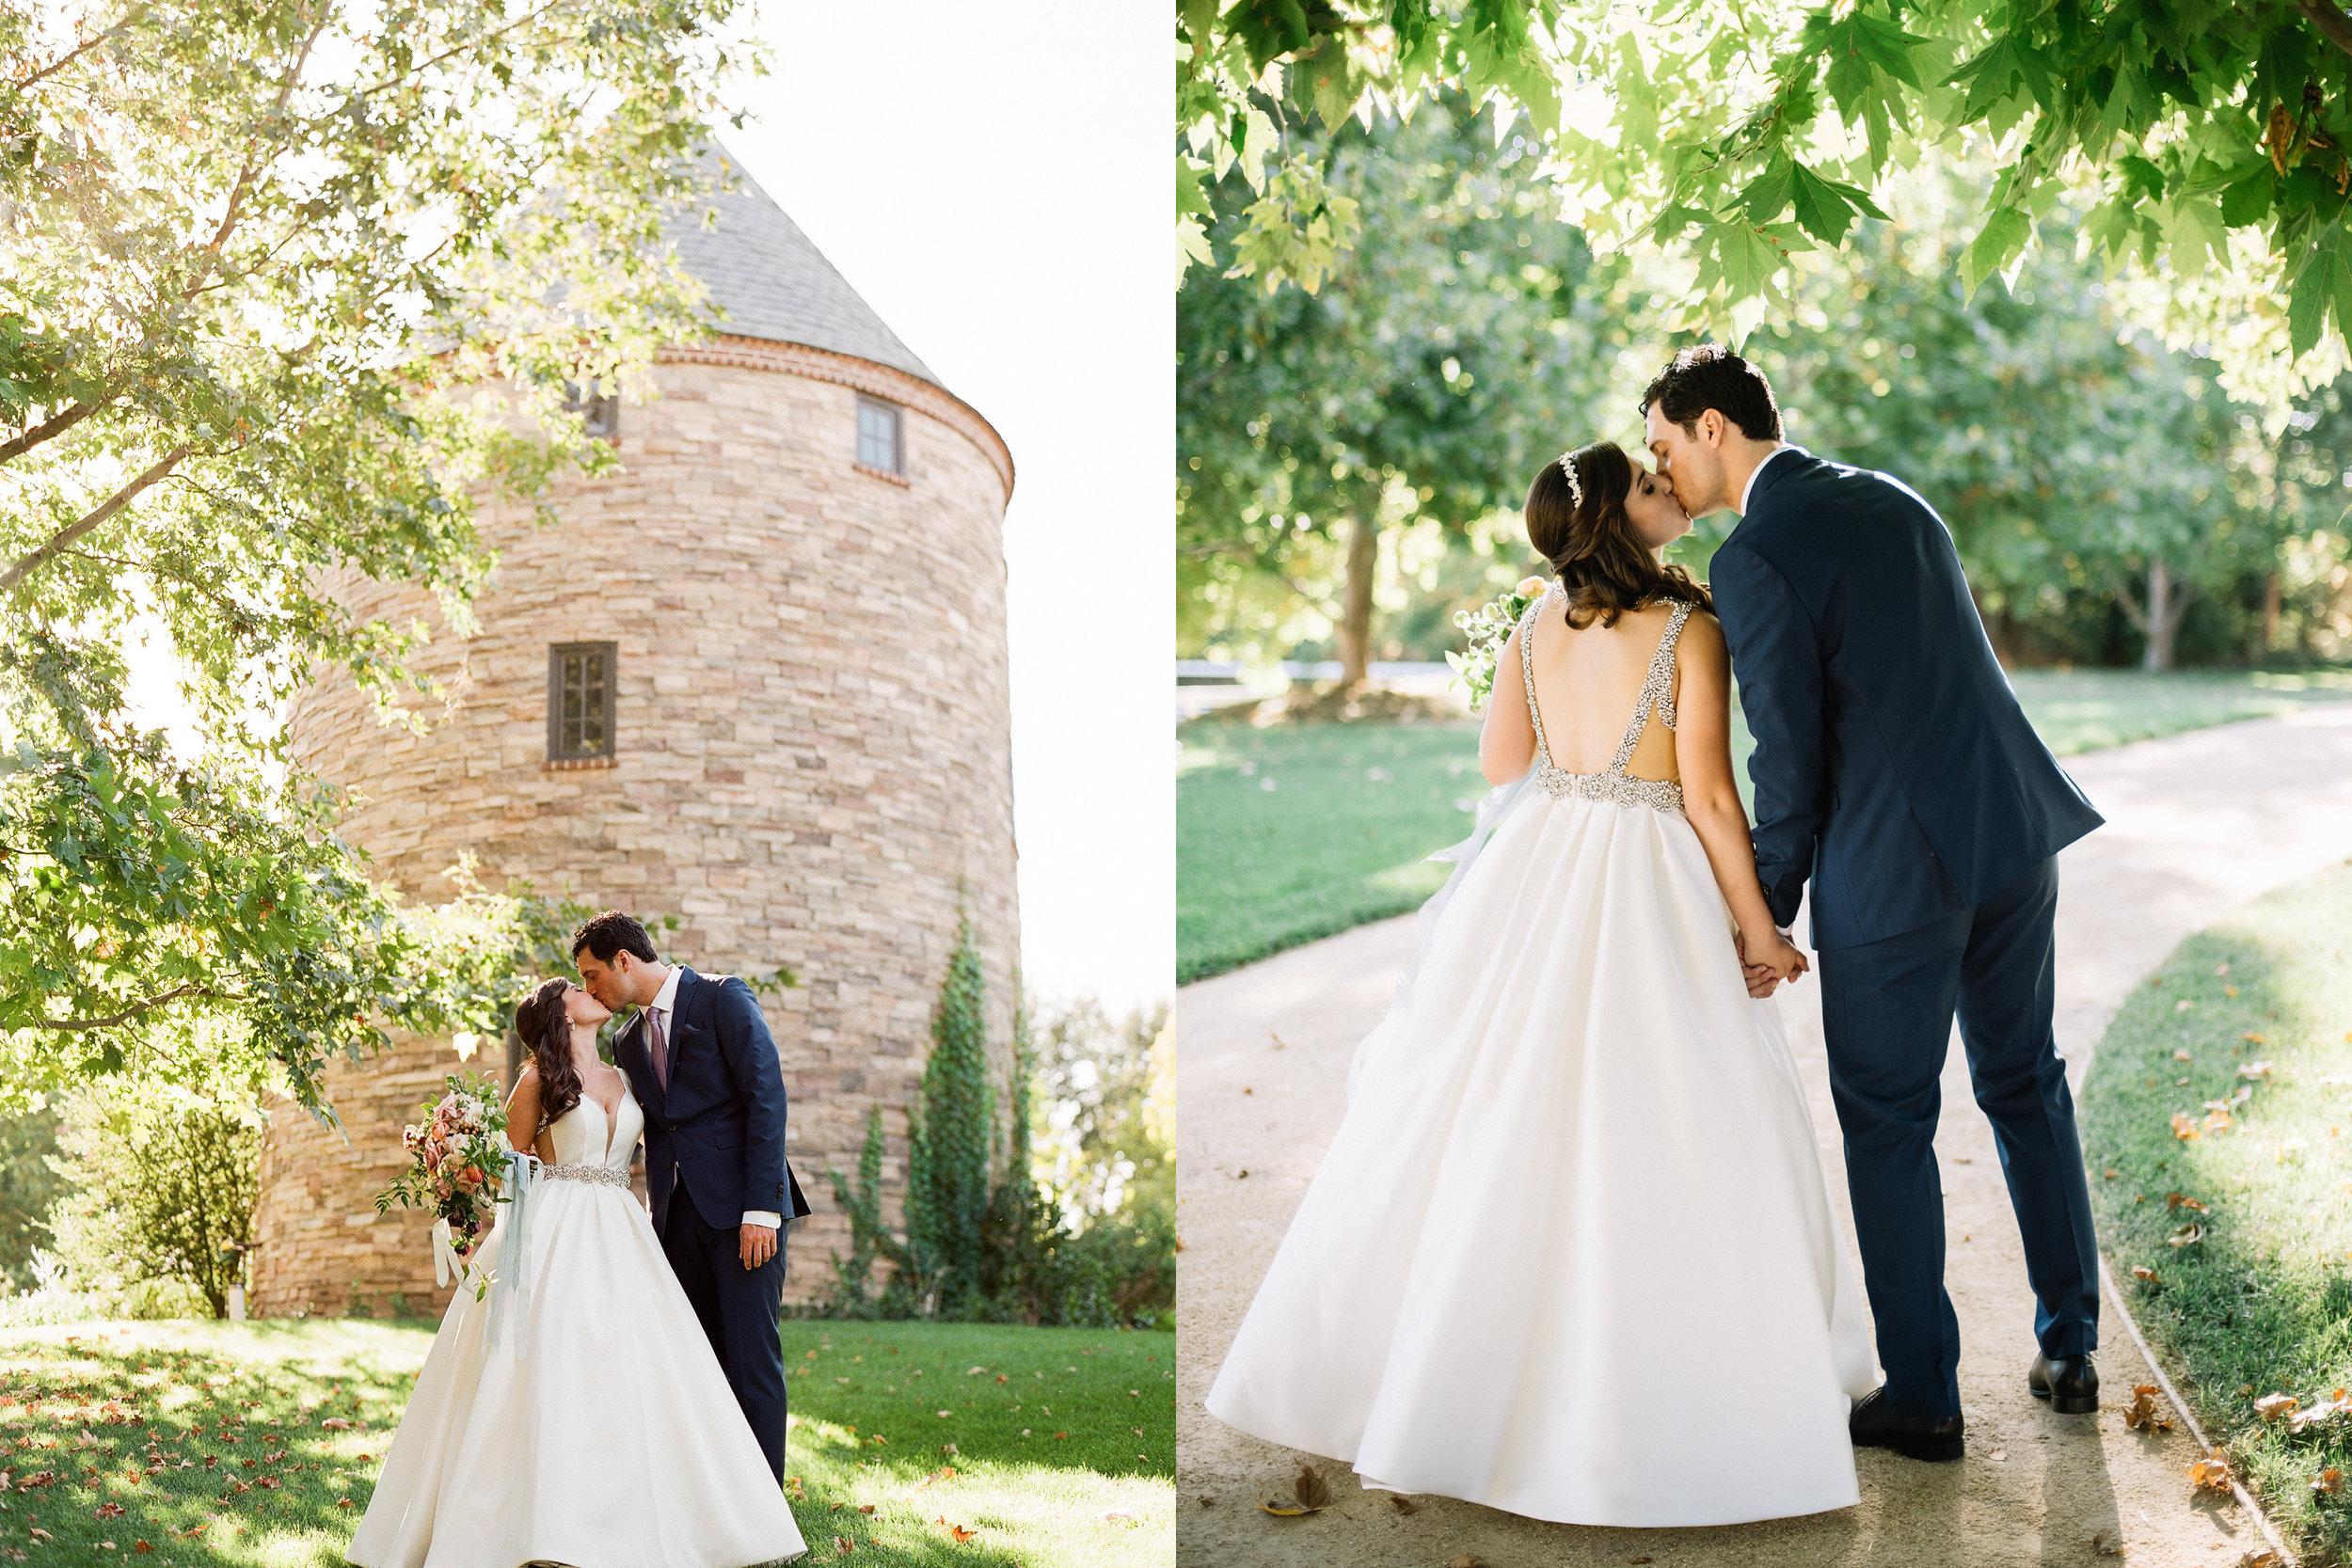 santa-barbara-elopement-elope-wedding-planner-planning-coordinator-day-of-intimate-event-design-kestrel-park-santa-ynez-english-country-estate-garden-castle (12).jpg